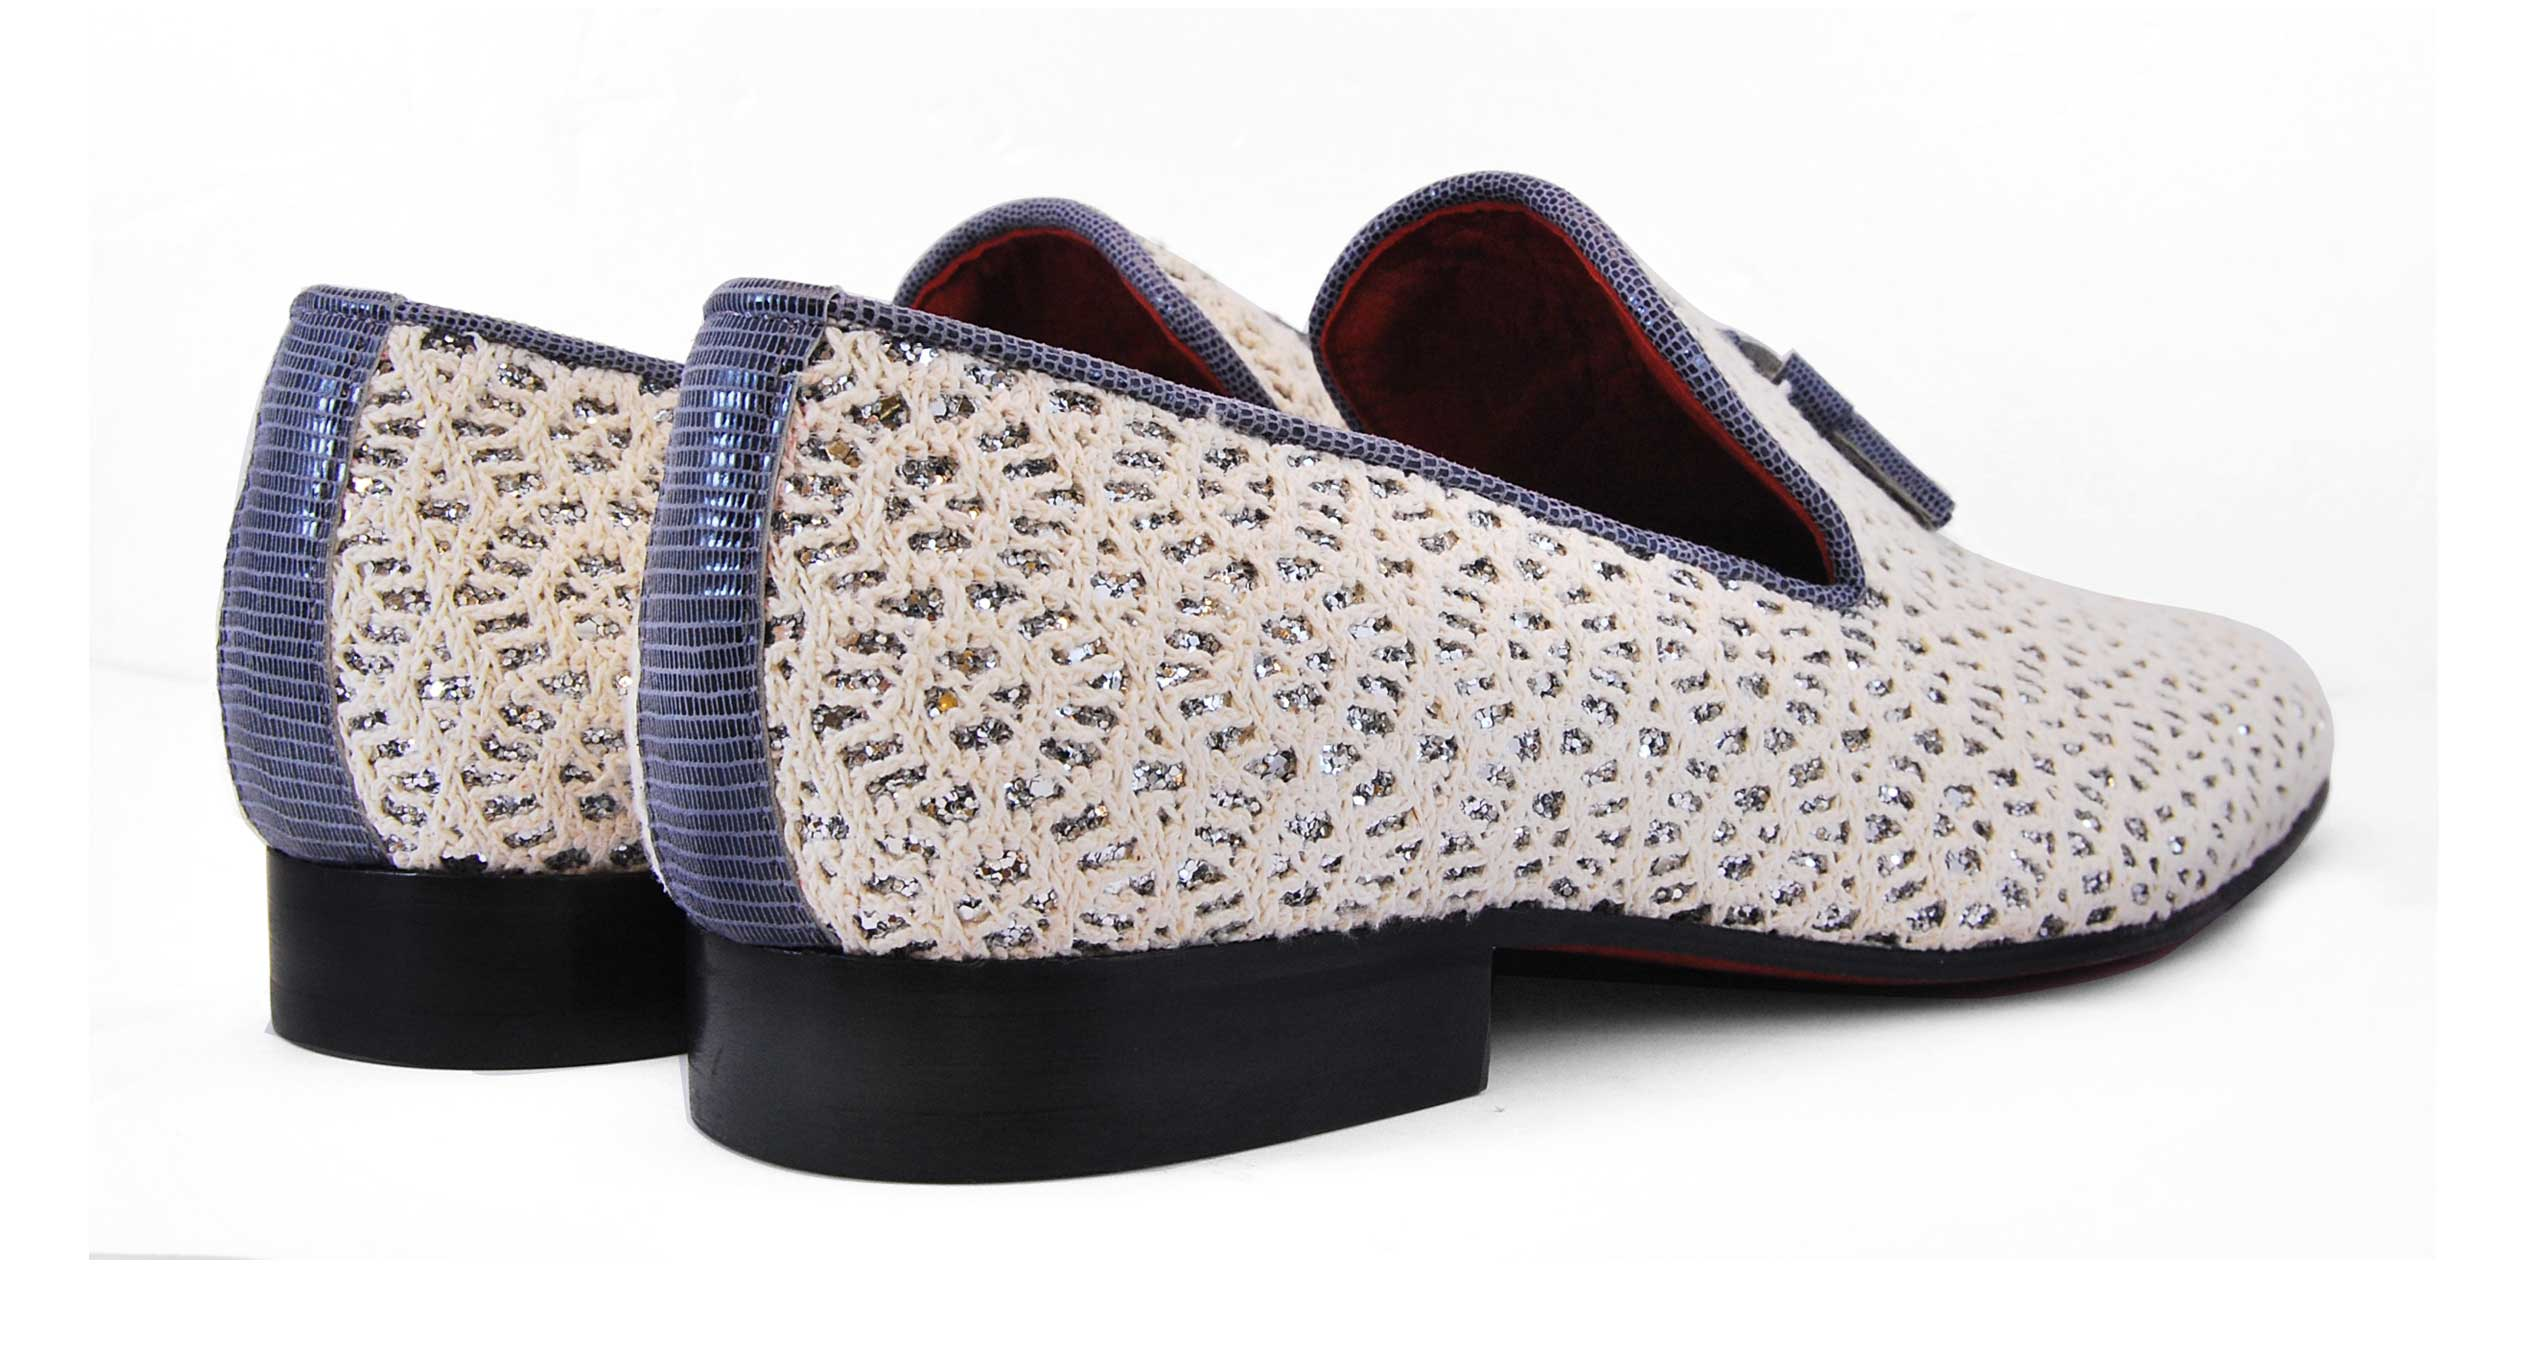 Foto 3 de Zapato Blanco Con Borla Cuero